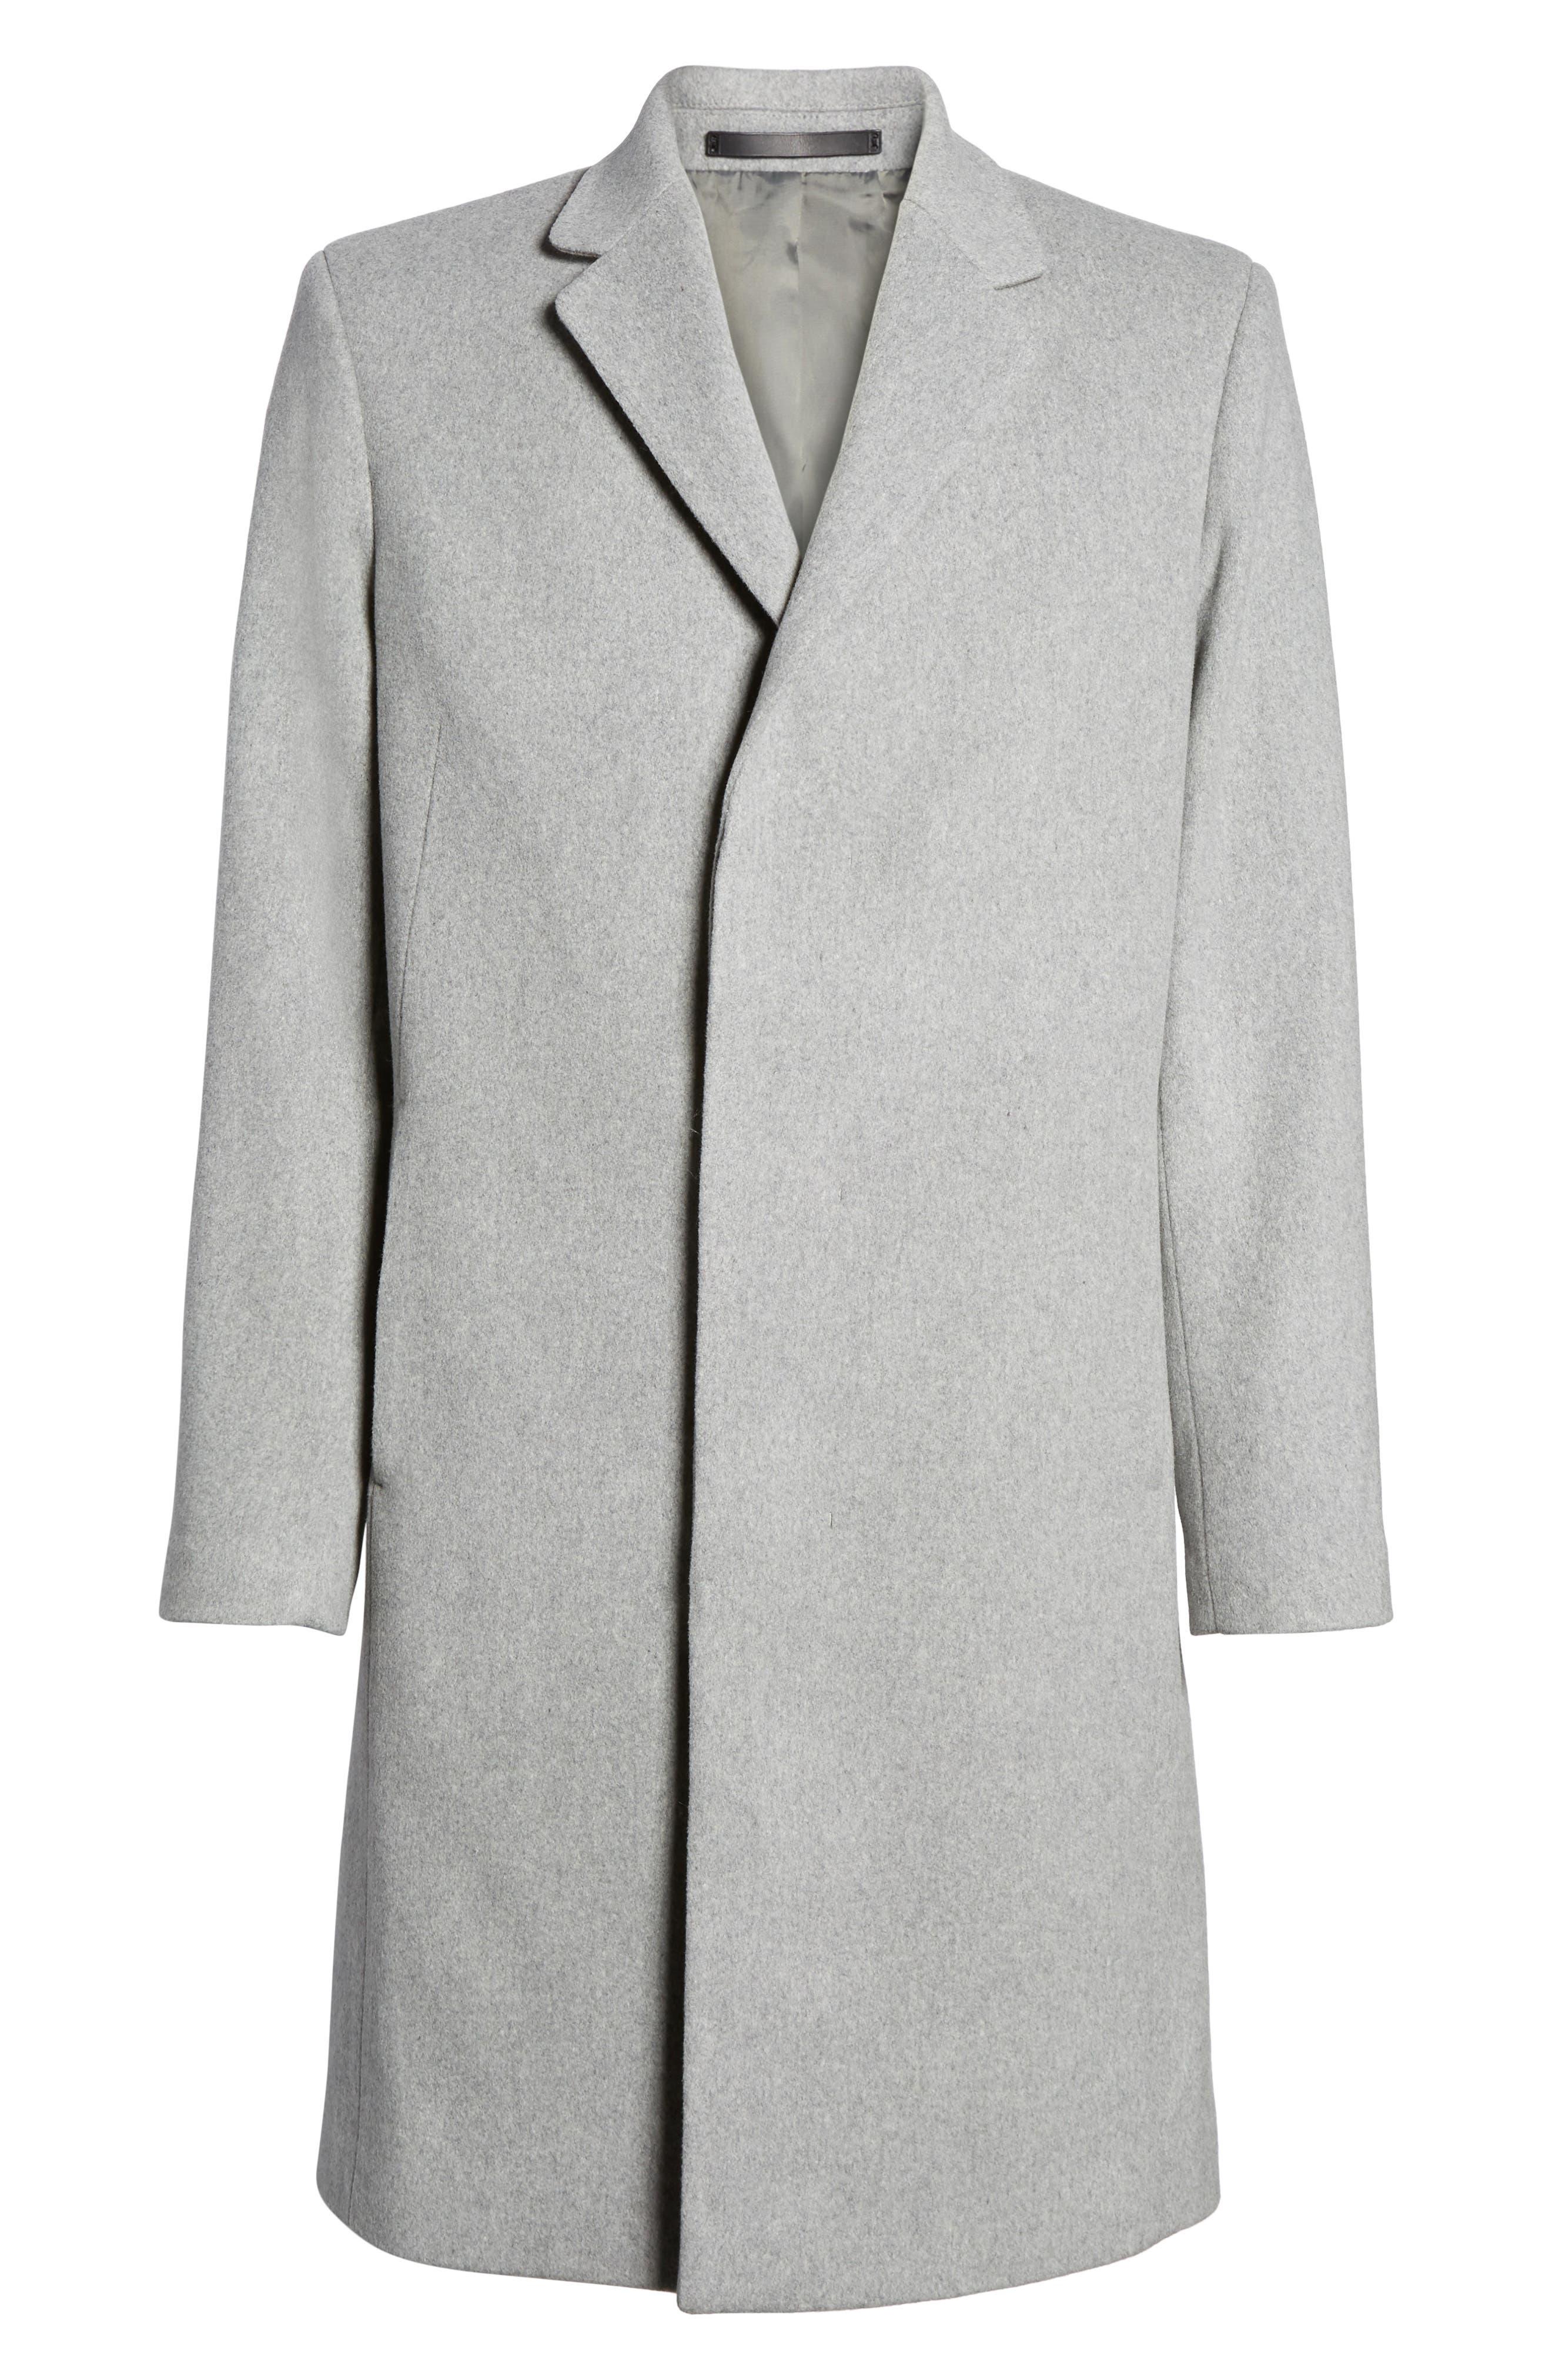 Bower Melton Wool Blend Topcoat,                             Alternate thumbnail 13, color,